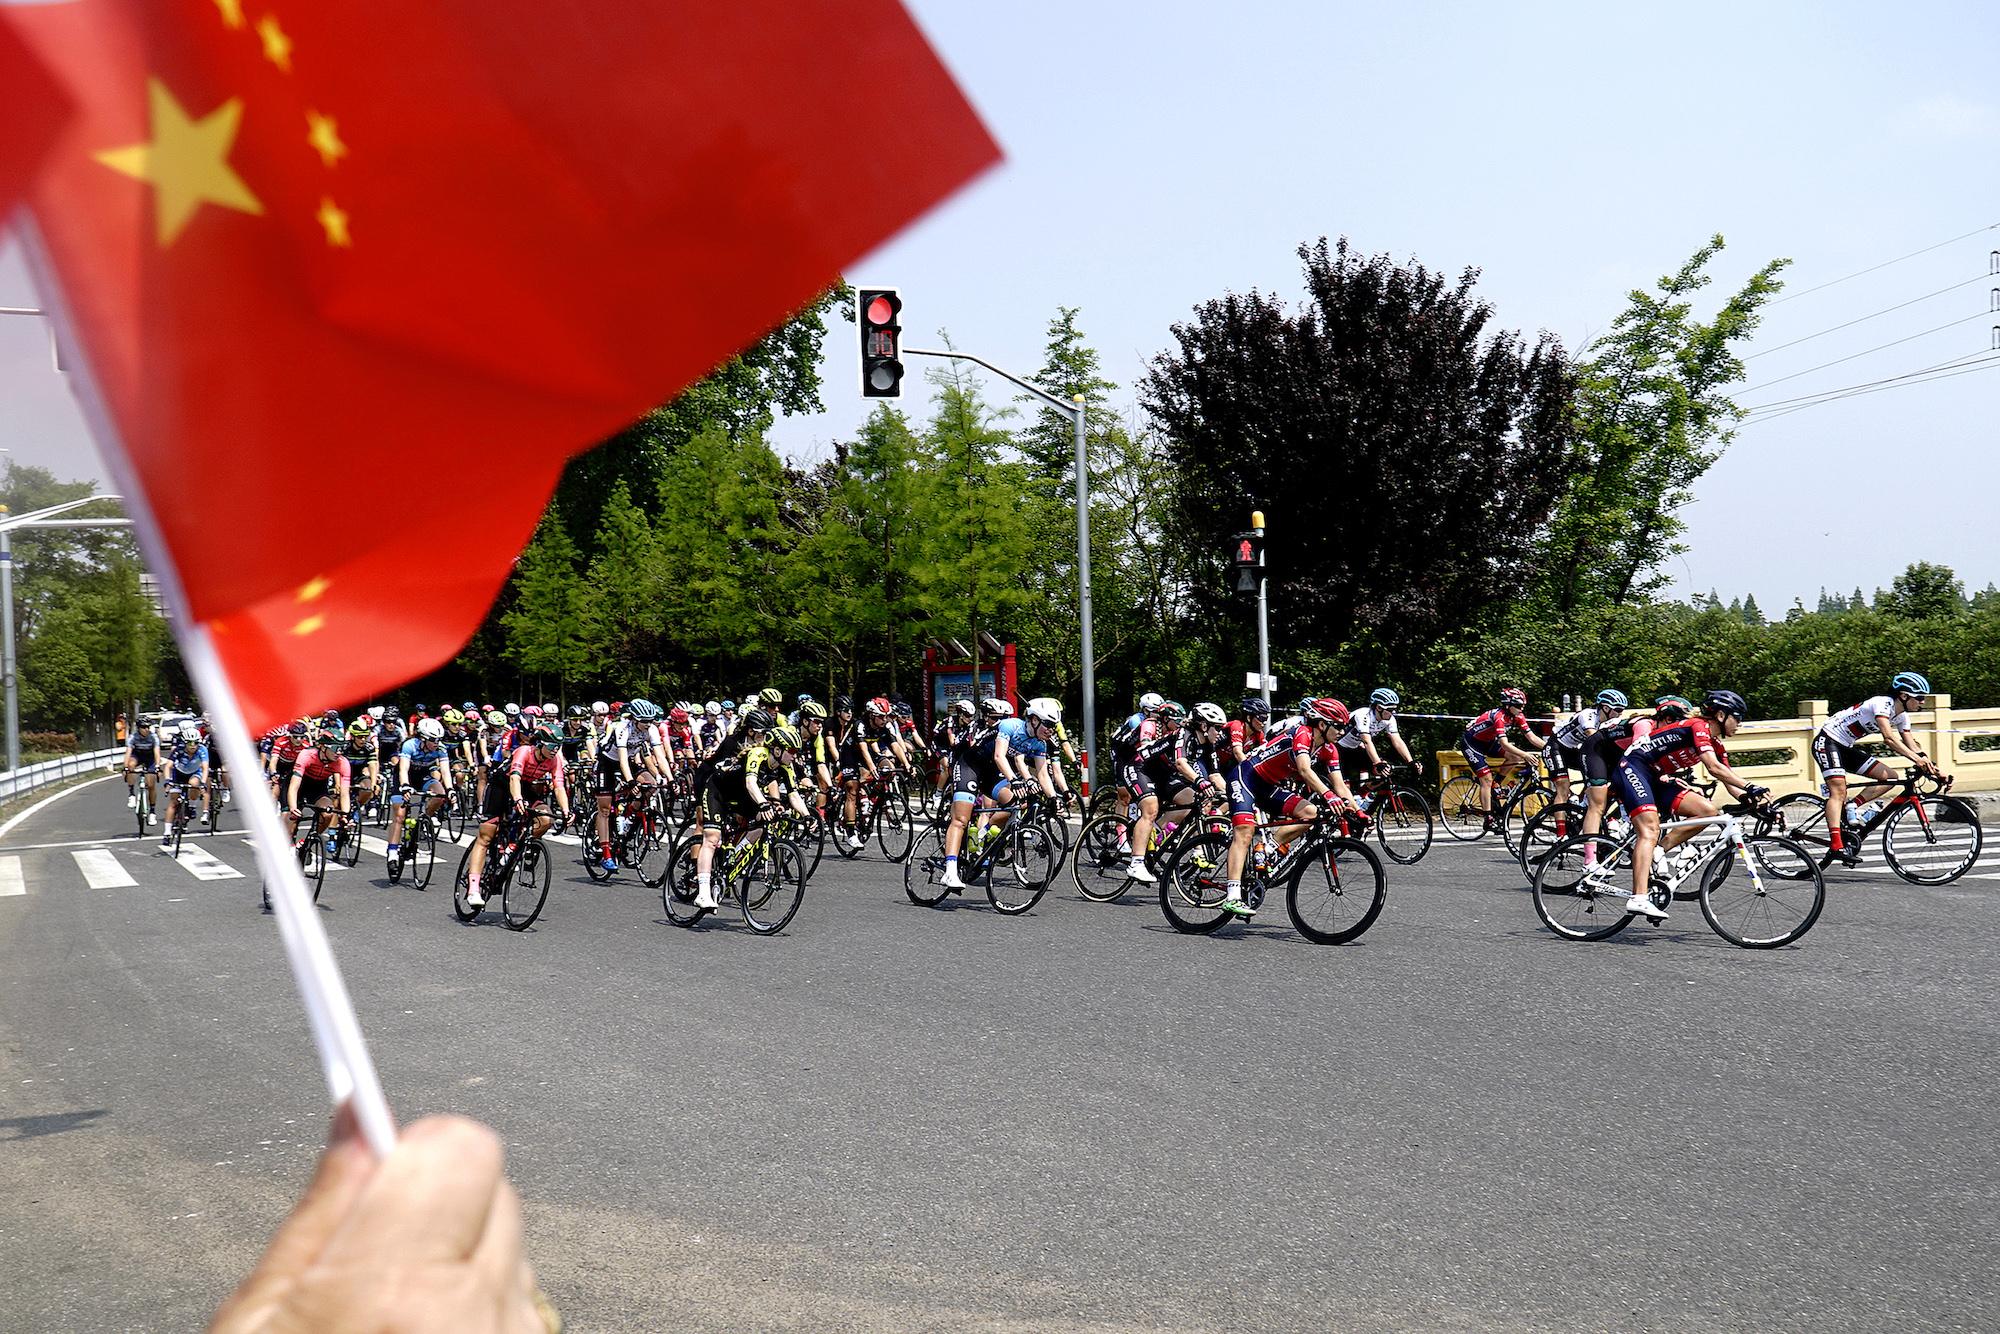 UCI postpones three upcoming Chinese races due to coronavirus outbreak - Cycling Weekly